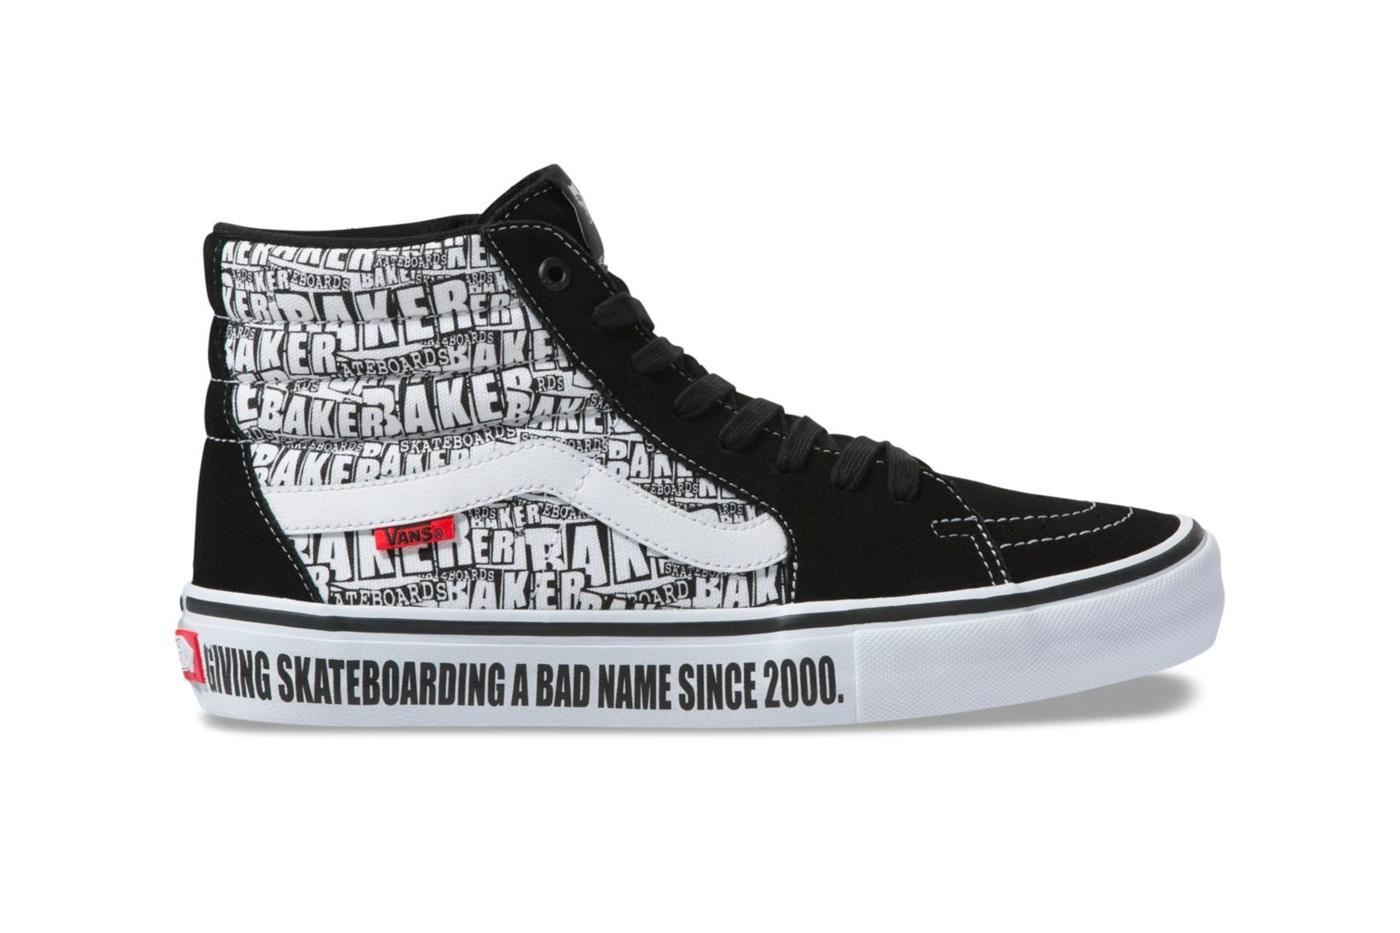 vans skateboards